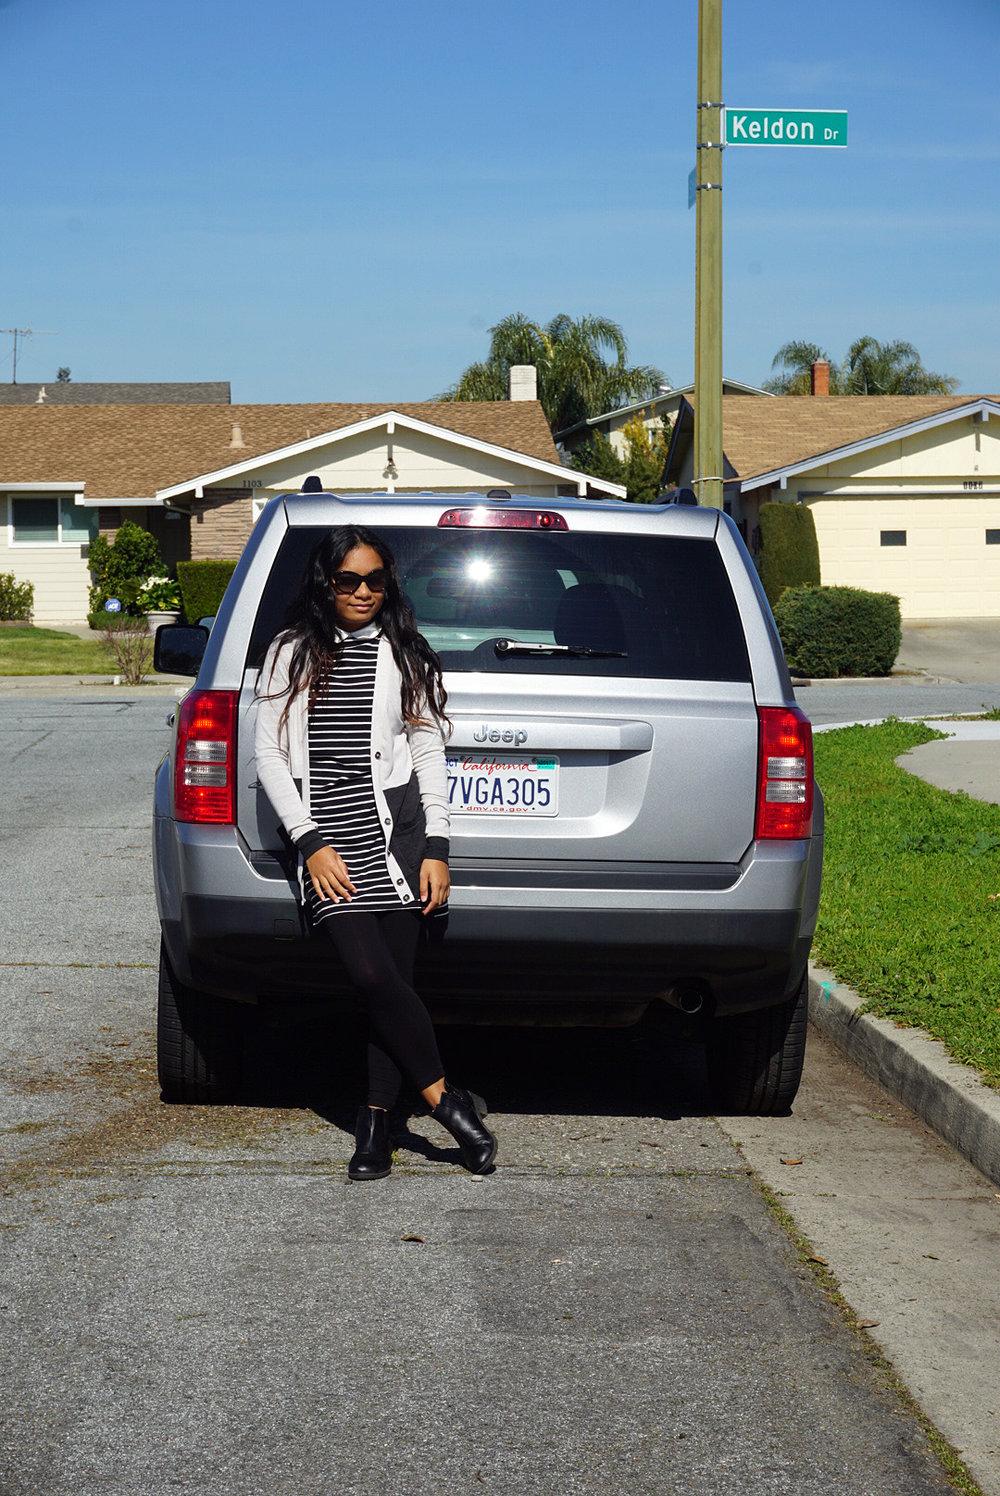 Striped-Collared-Dress-Long-Sleeves-Collar-Shirt-Fake-Import-Model-Blogger-Style-LINDATENCHITRAN-2-1616x1080.jpg